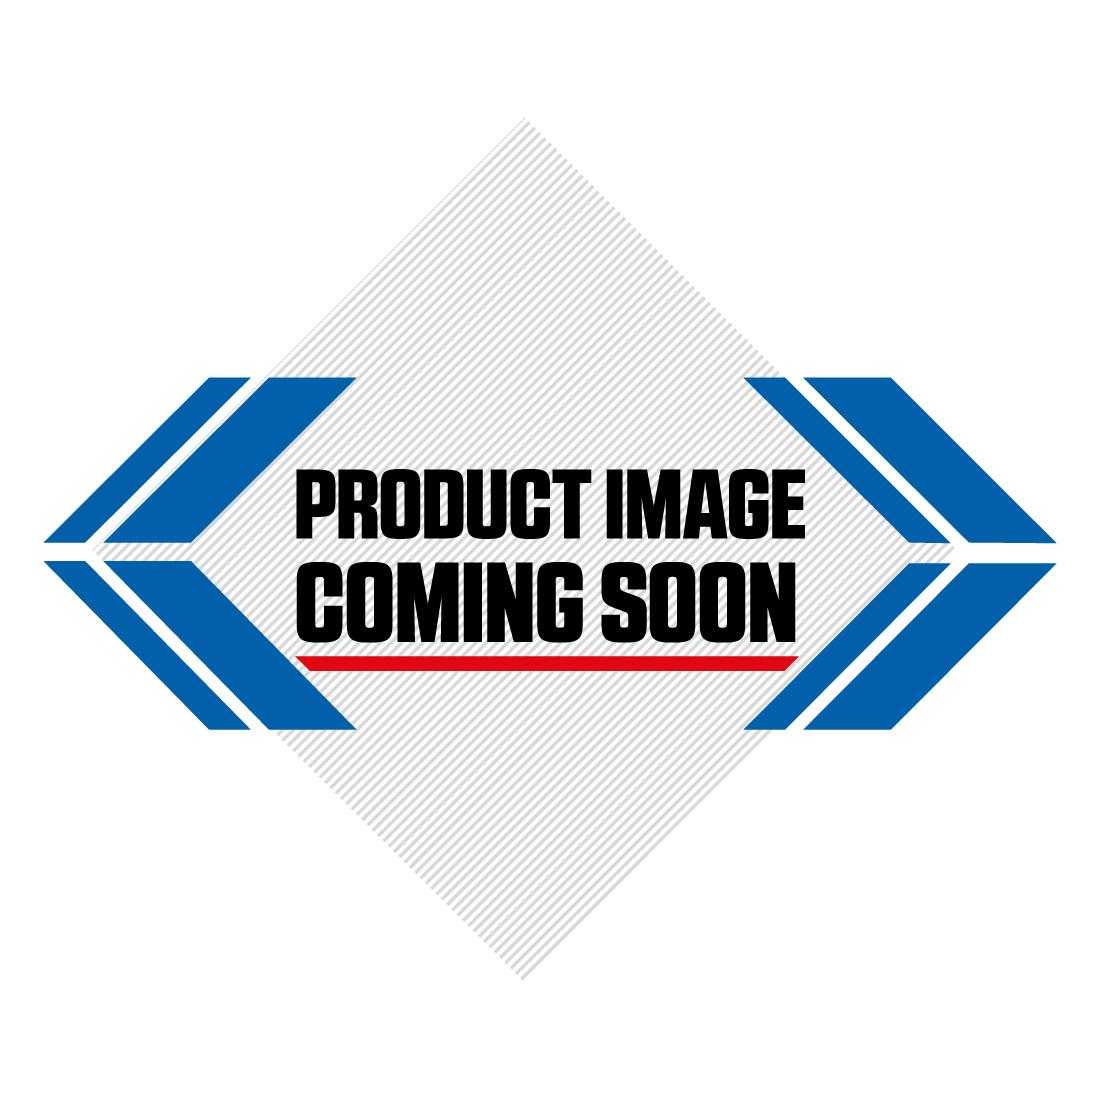 Silkolene Comp 4 10w-40 XP Ester Based Semi Synthetic Bike Engine Oil - 4 Cube Image-0